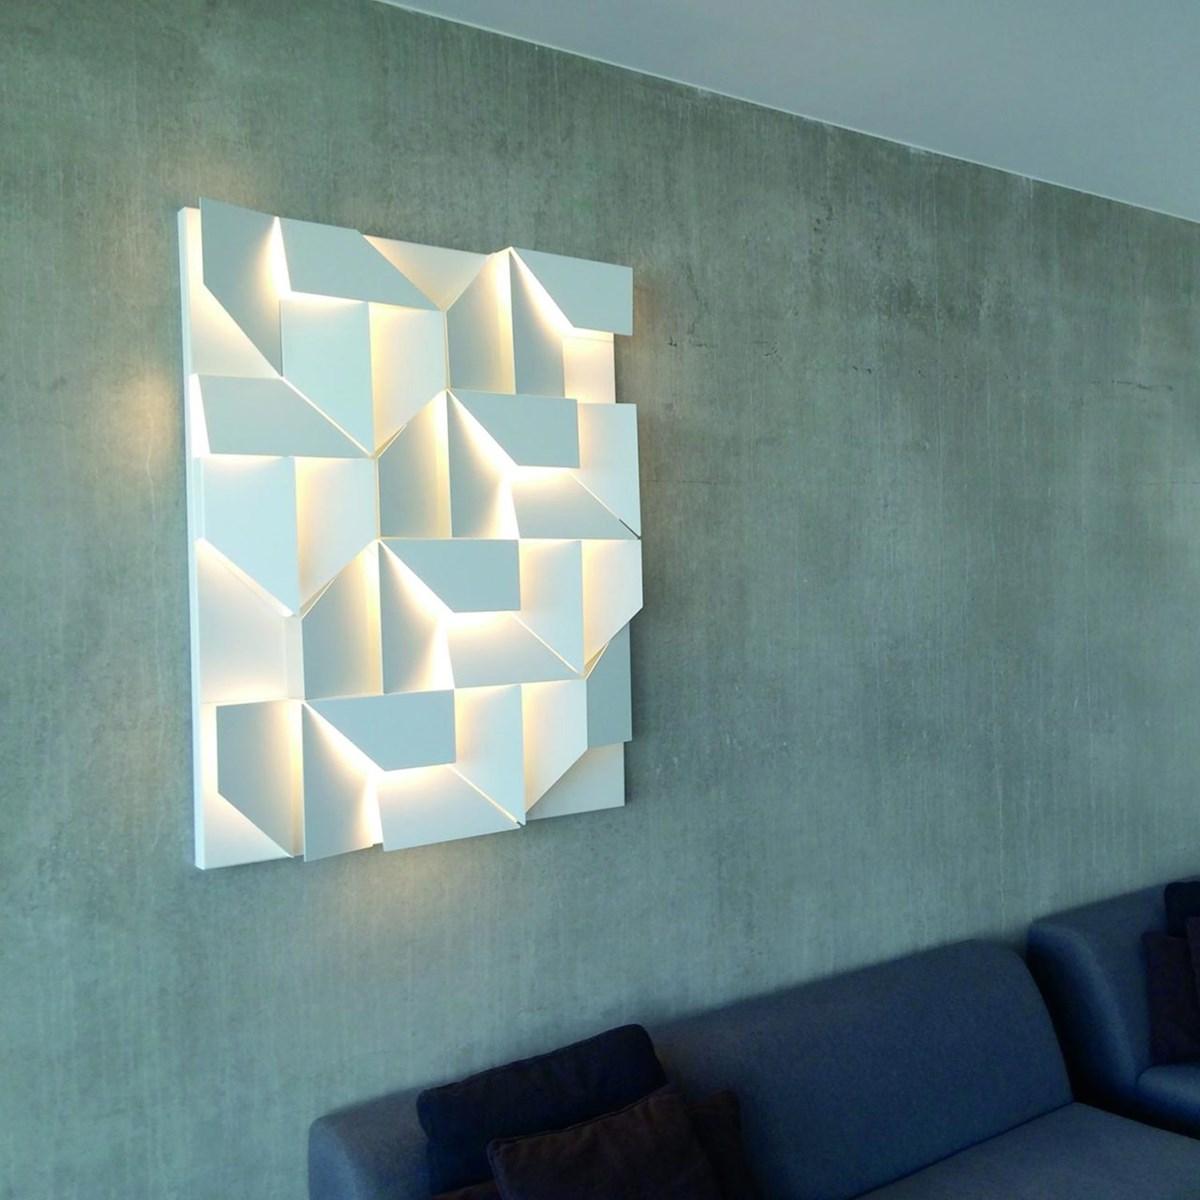 Nemo-Charles-Kalpakian-Wall-Shadows-Grande-Light-Matisse-7